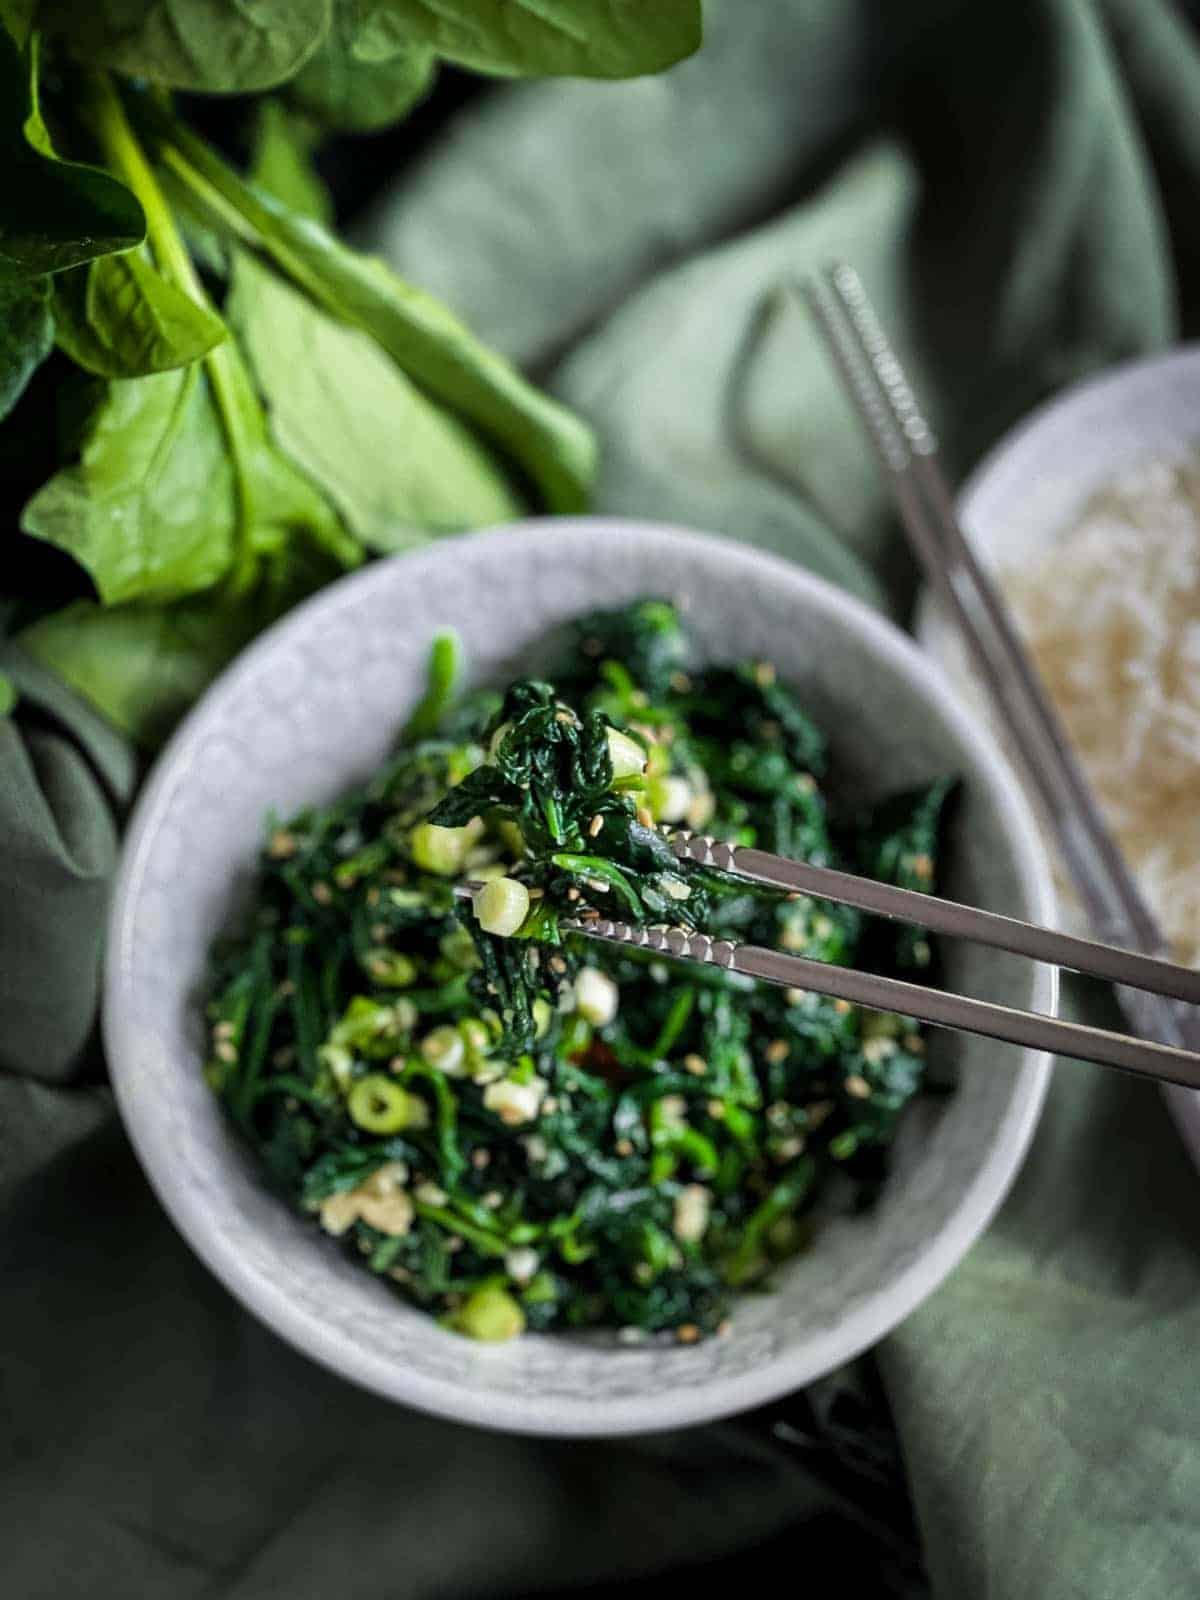 Korean Spinach Side Dish - Sigeumchi Namul